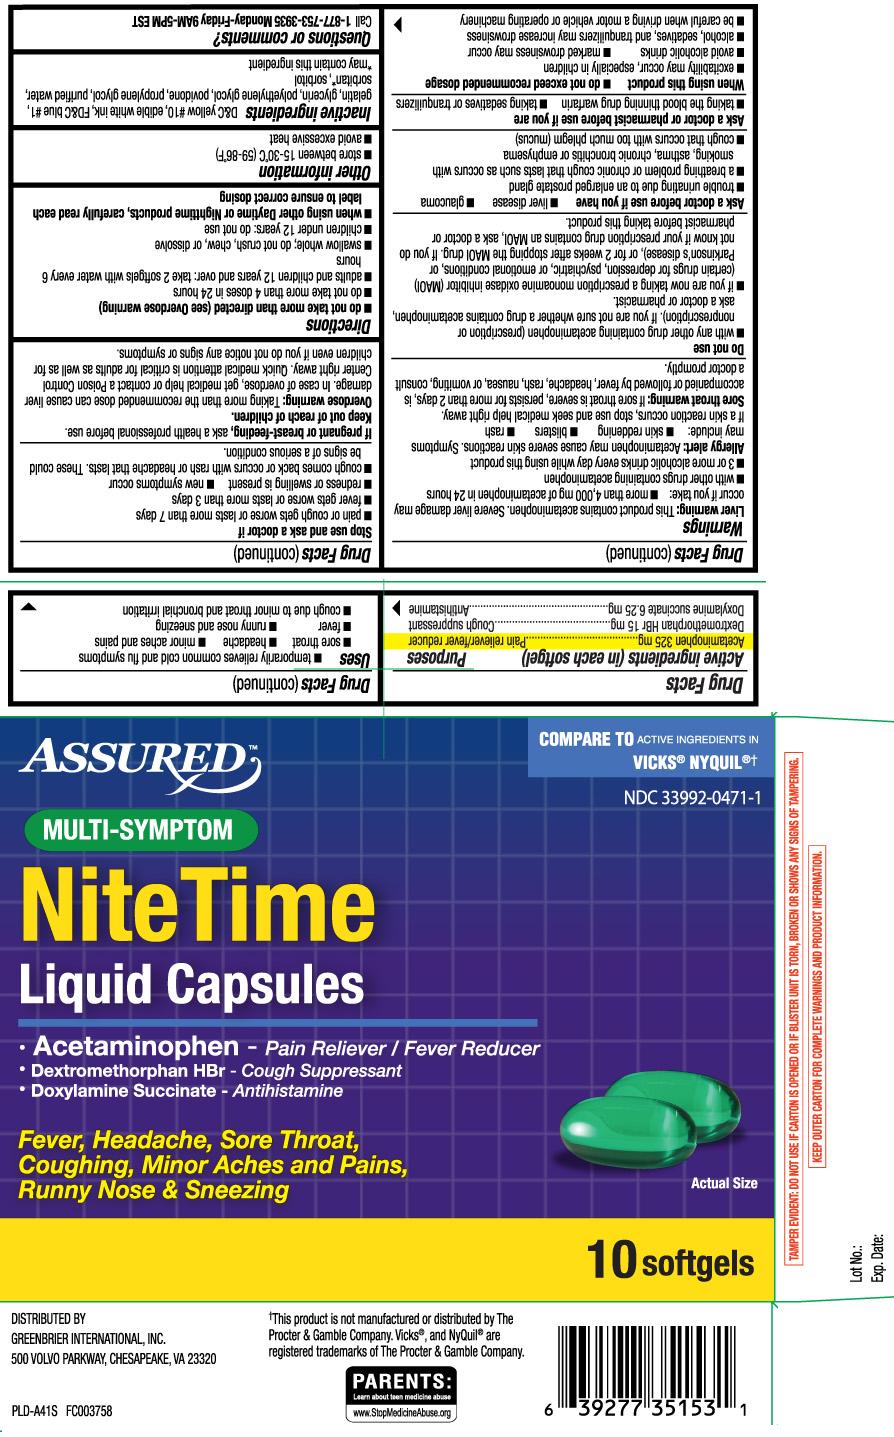 Acetaminophen 325 mg, Dextromethorphan HBr 15 mg, Doxylamine Succinate 6.25 mg